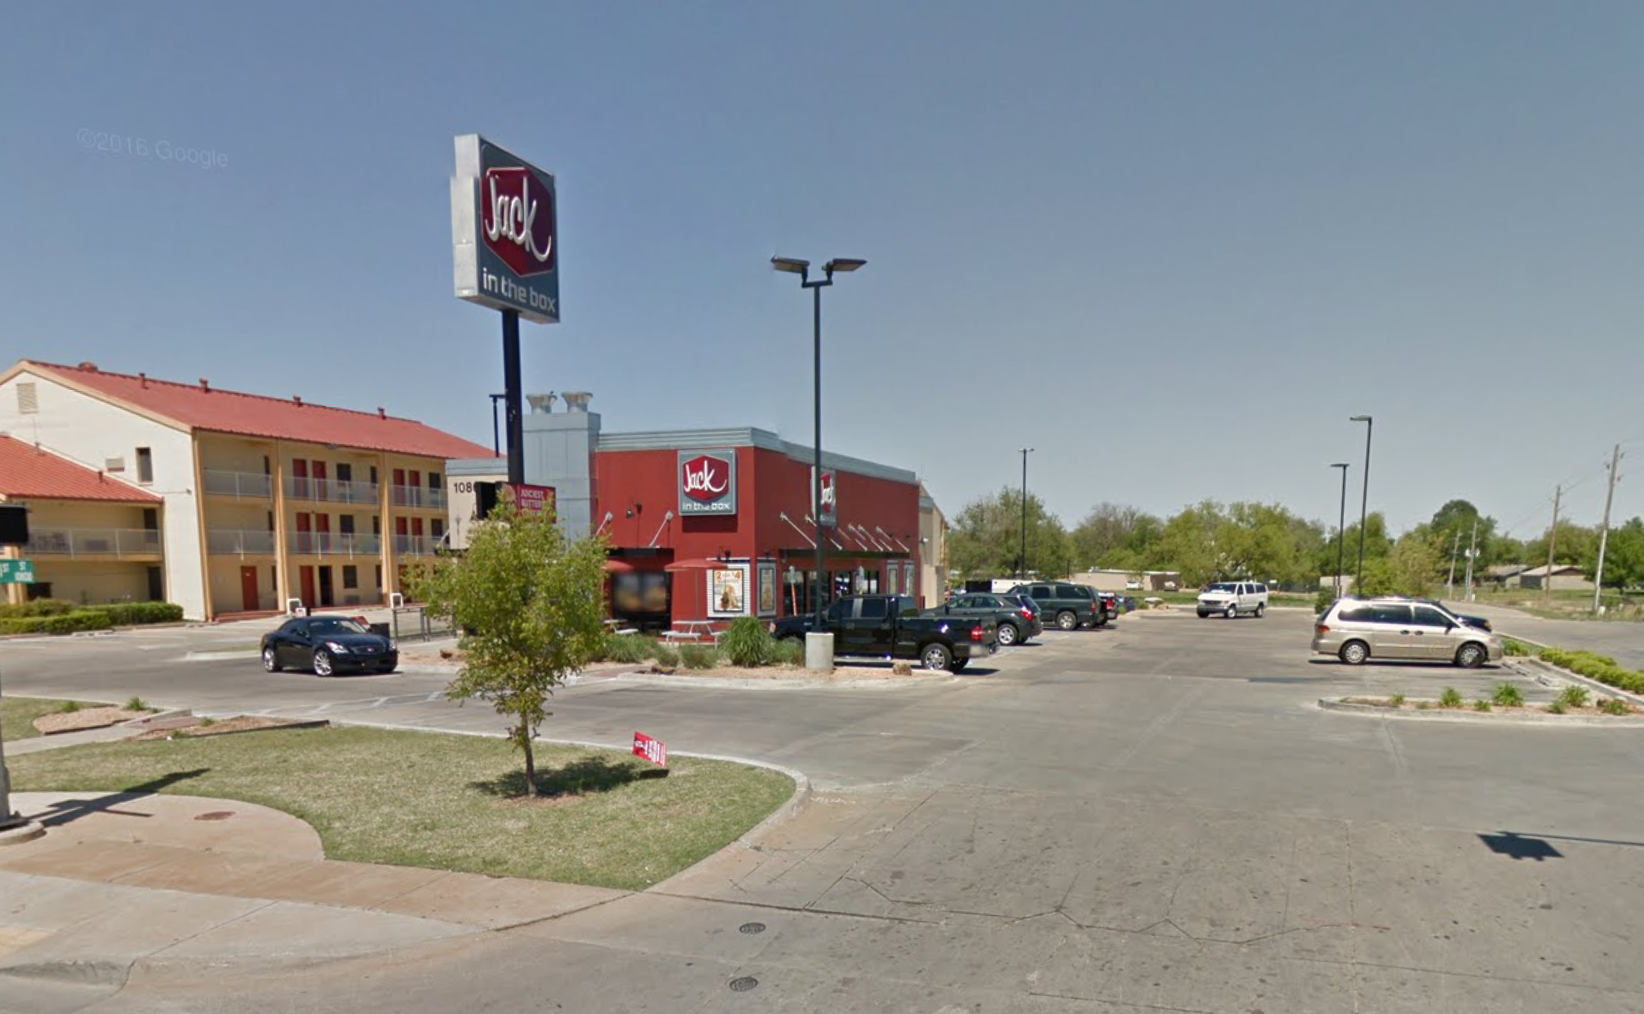 1-Cover-page-Tulsa-JIB_Page_1_Image_0002.jpg